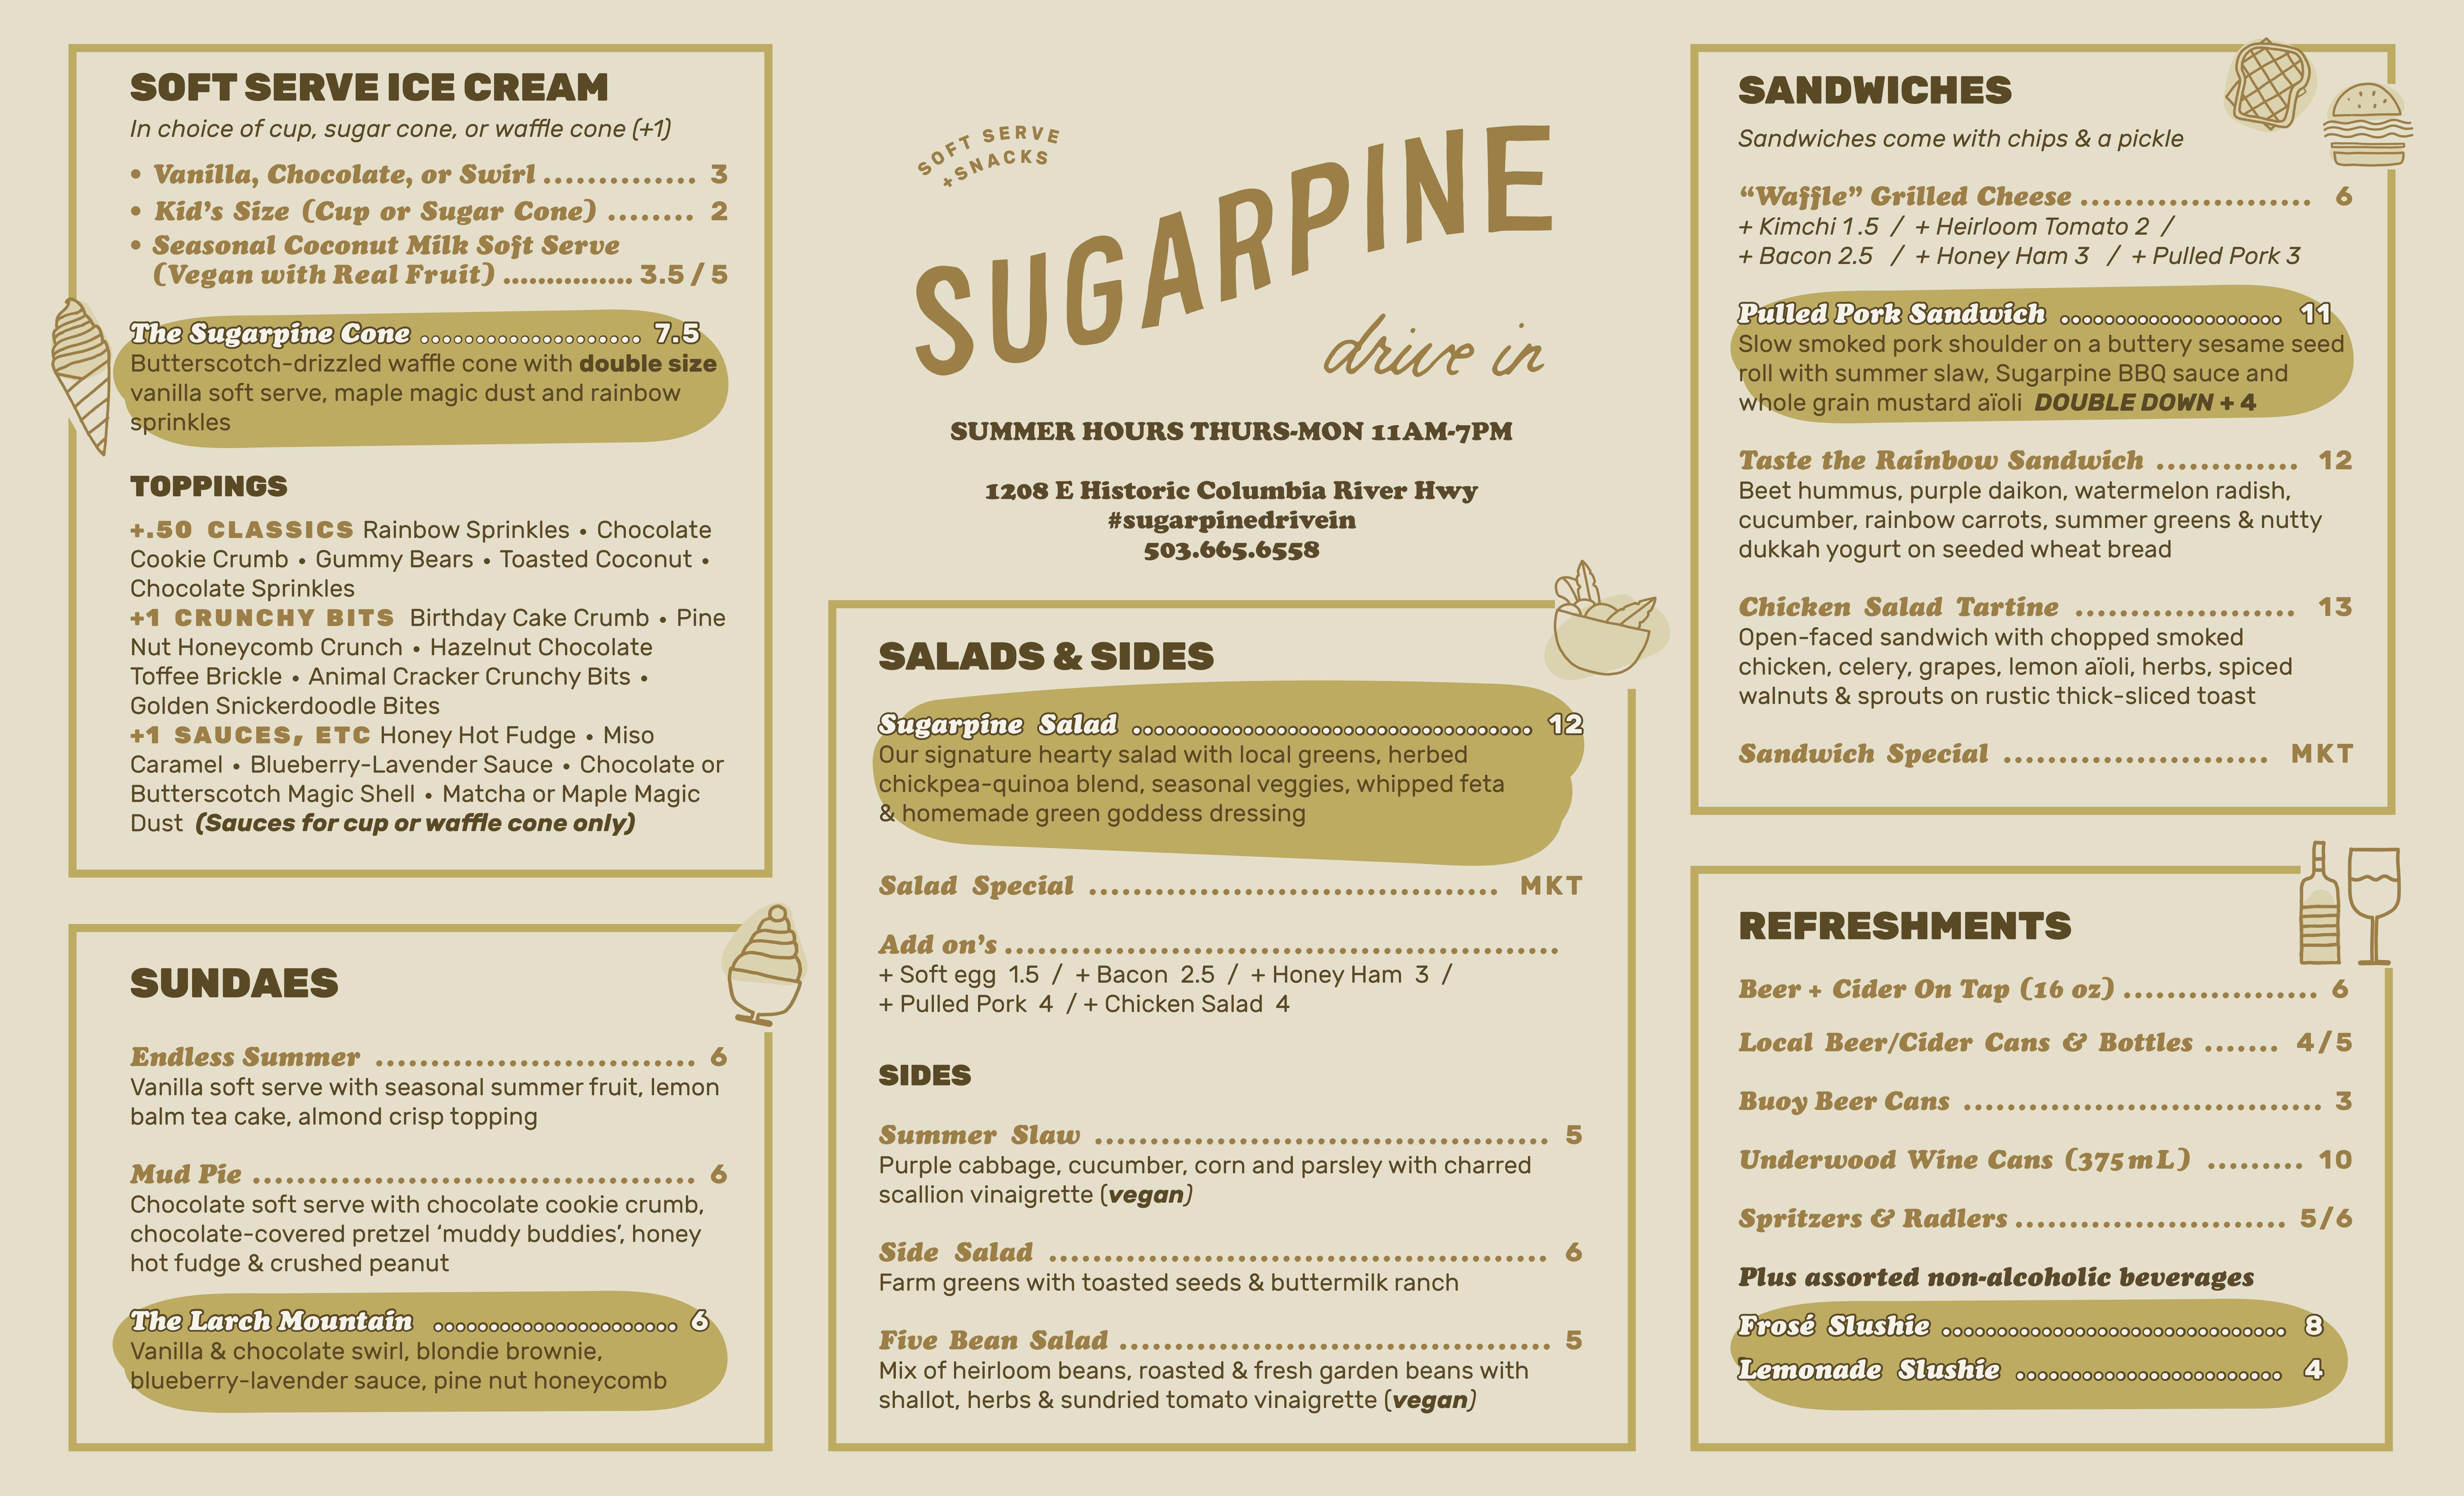 Sugarpine Menu V2 7.13.19